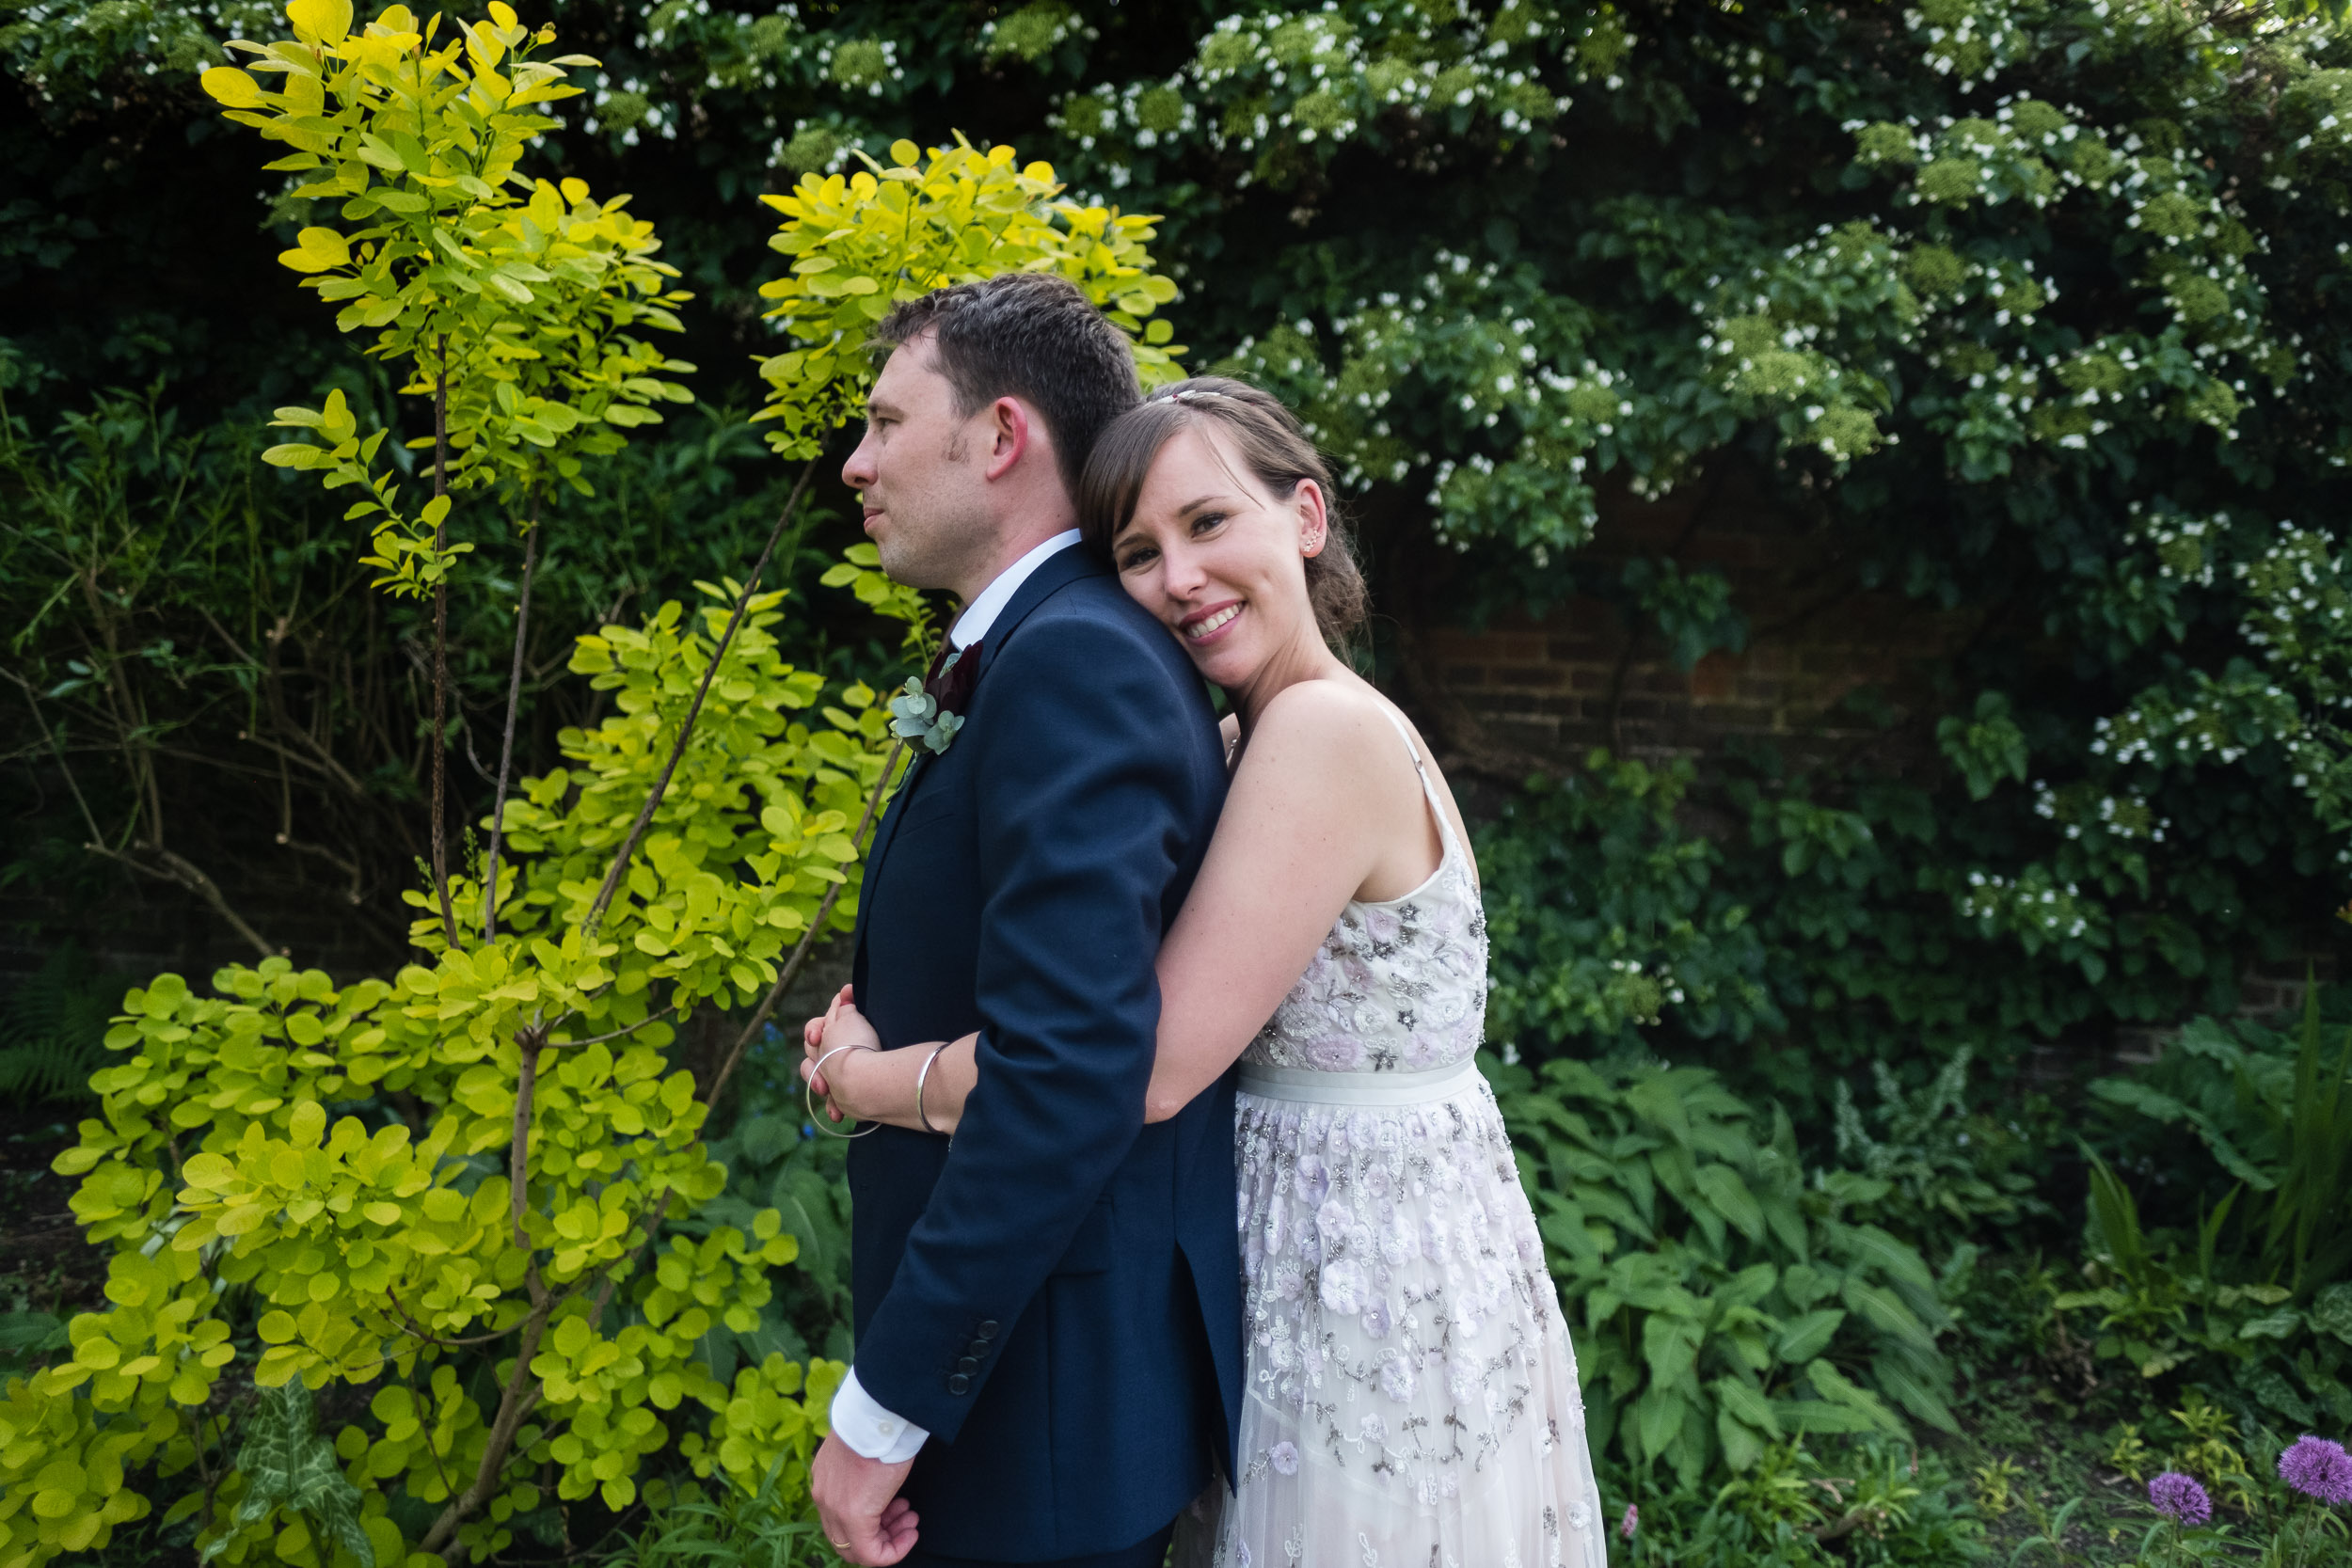 brockwell-lido-brixton-herne-hill-wedding-285.jpg